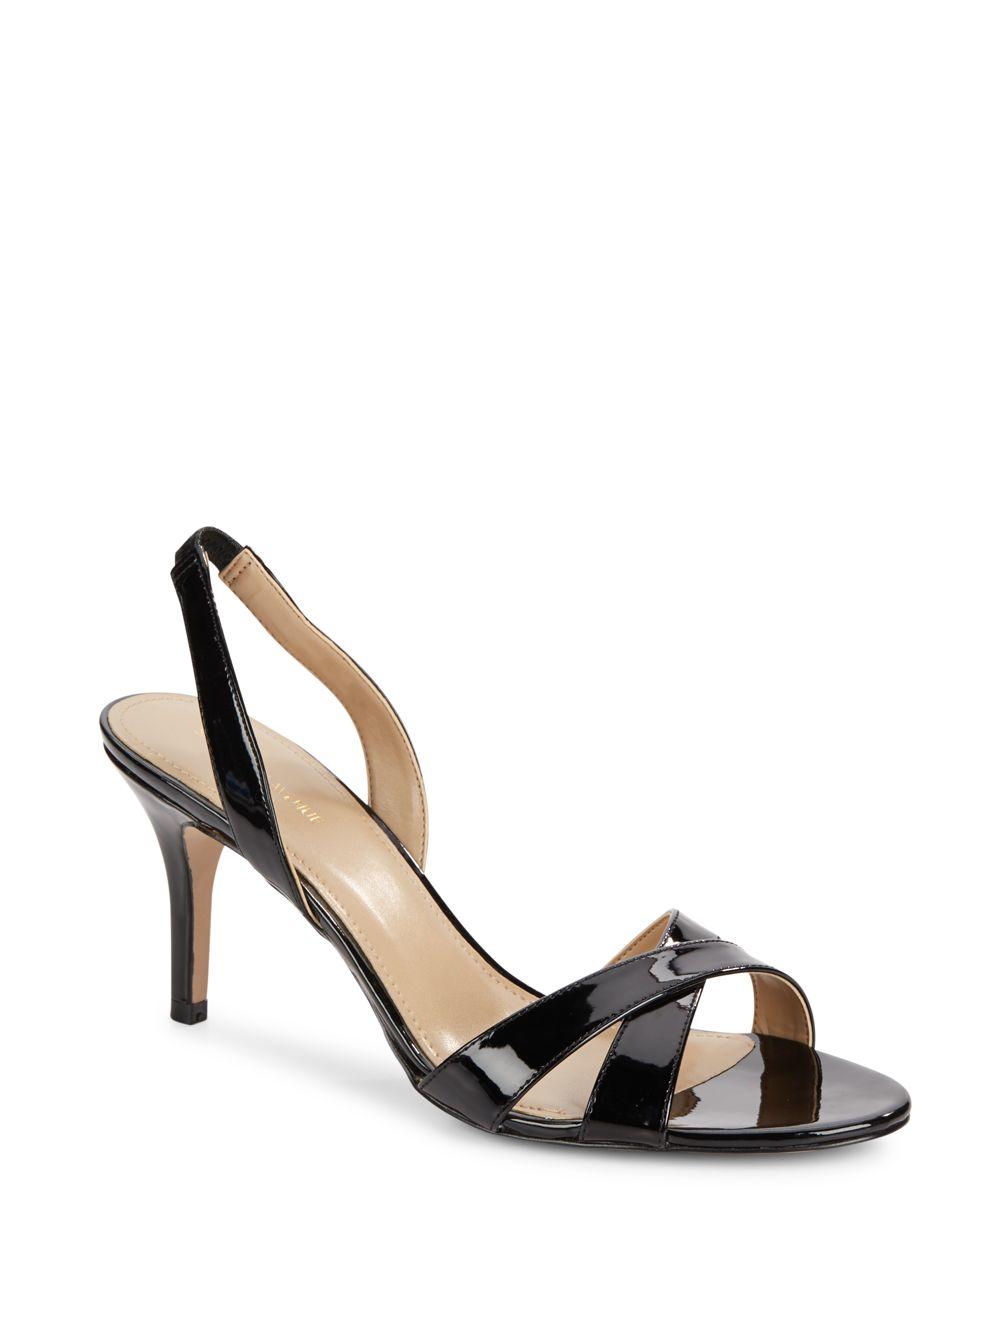 saks fifth avenue lolynn slingback high heel sandals in